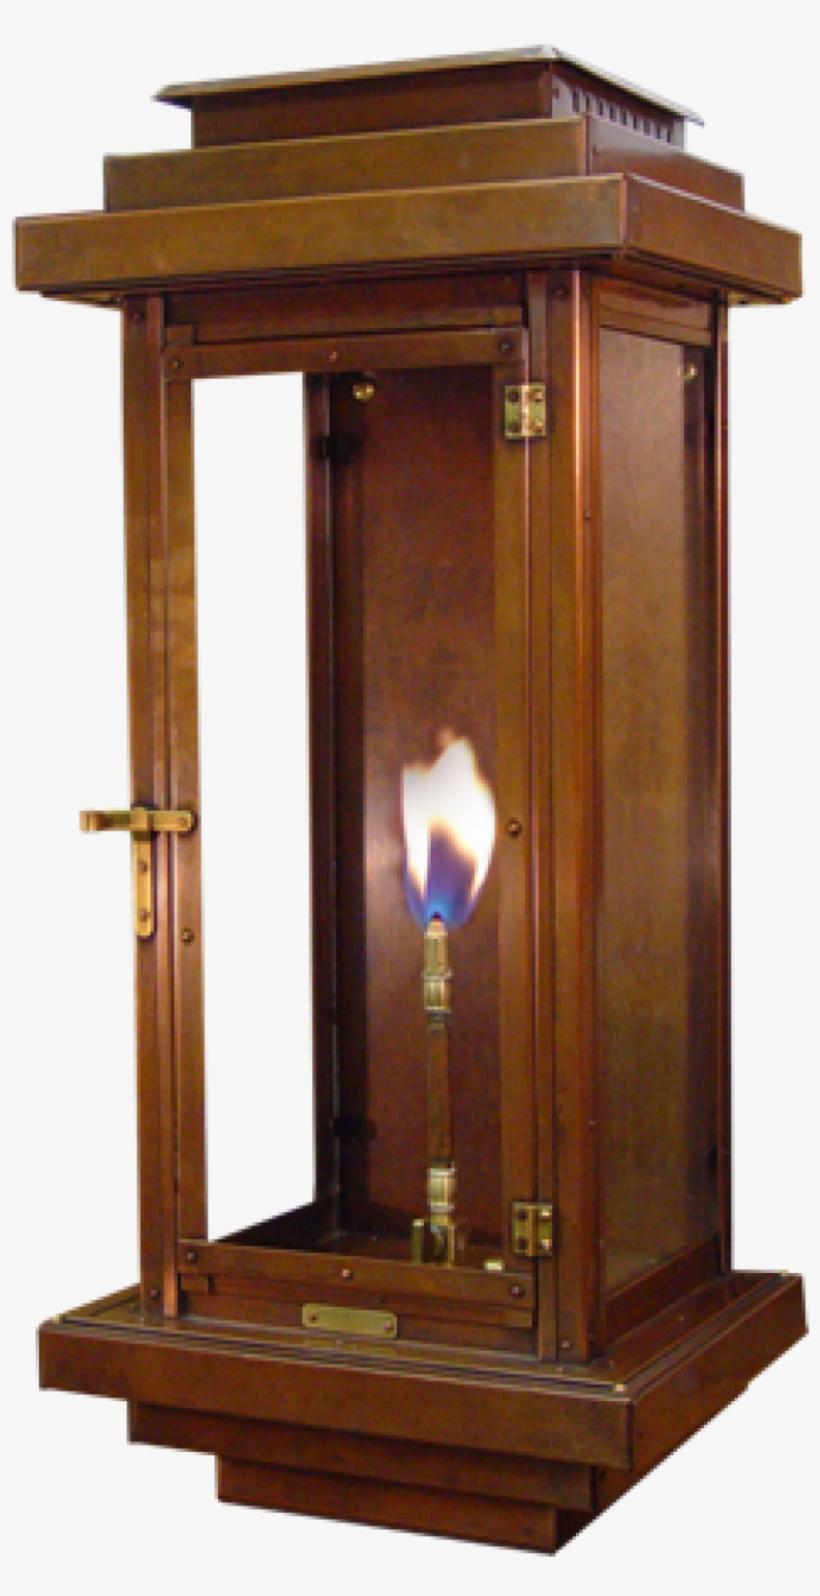 Fascinating Lamp Decoration In Natural Gas Light Fixtures - Gas Lighting, transparent png #5399083